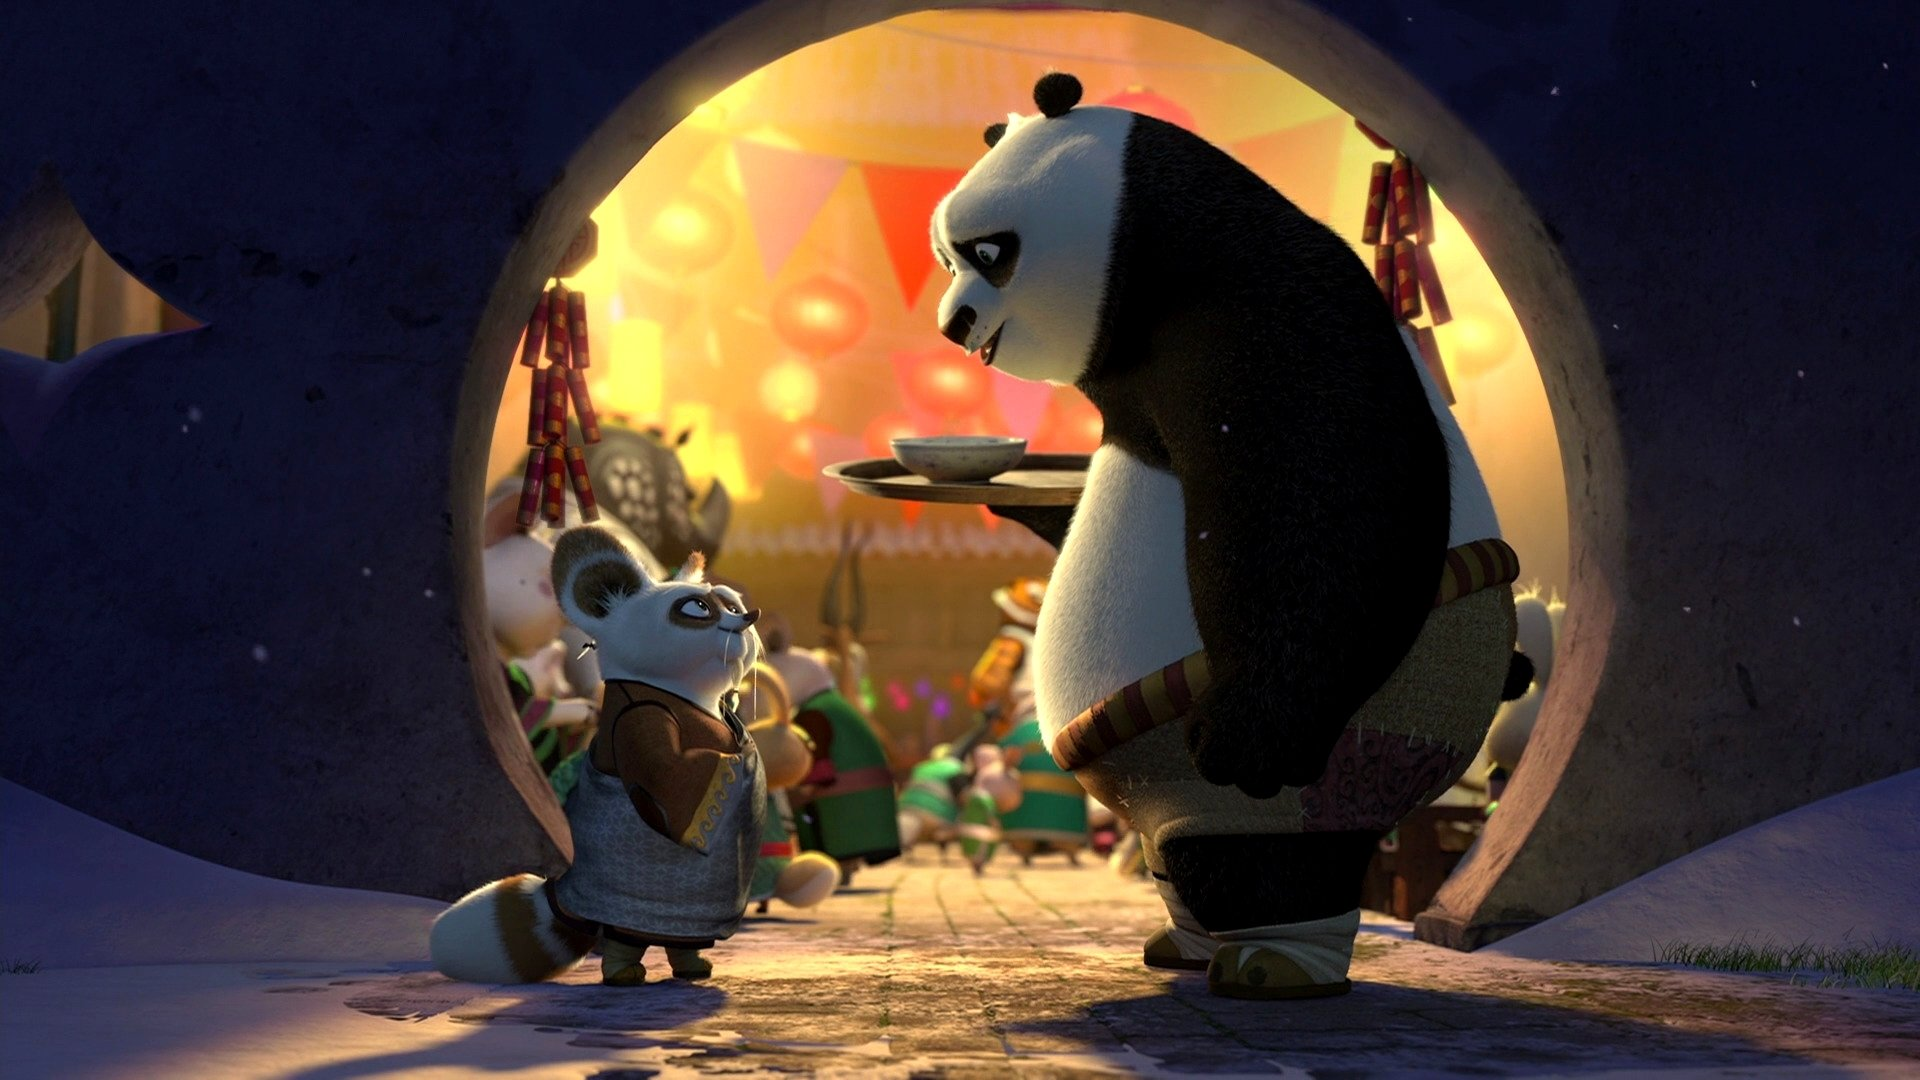 2 Kung Fu Panda Holiday Hd Wallpapers Background Images